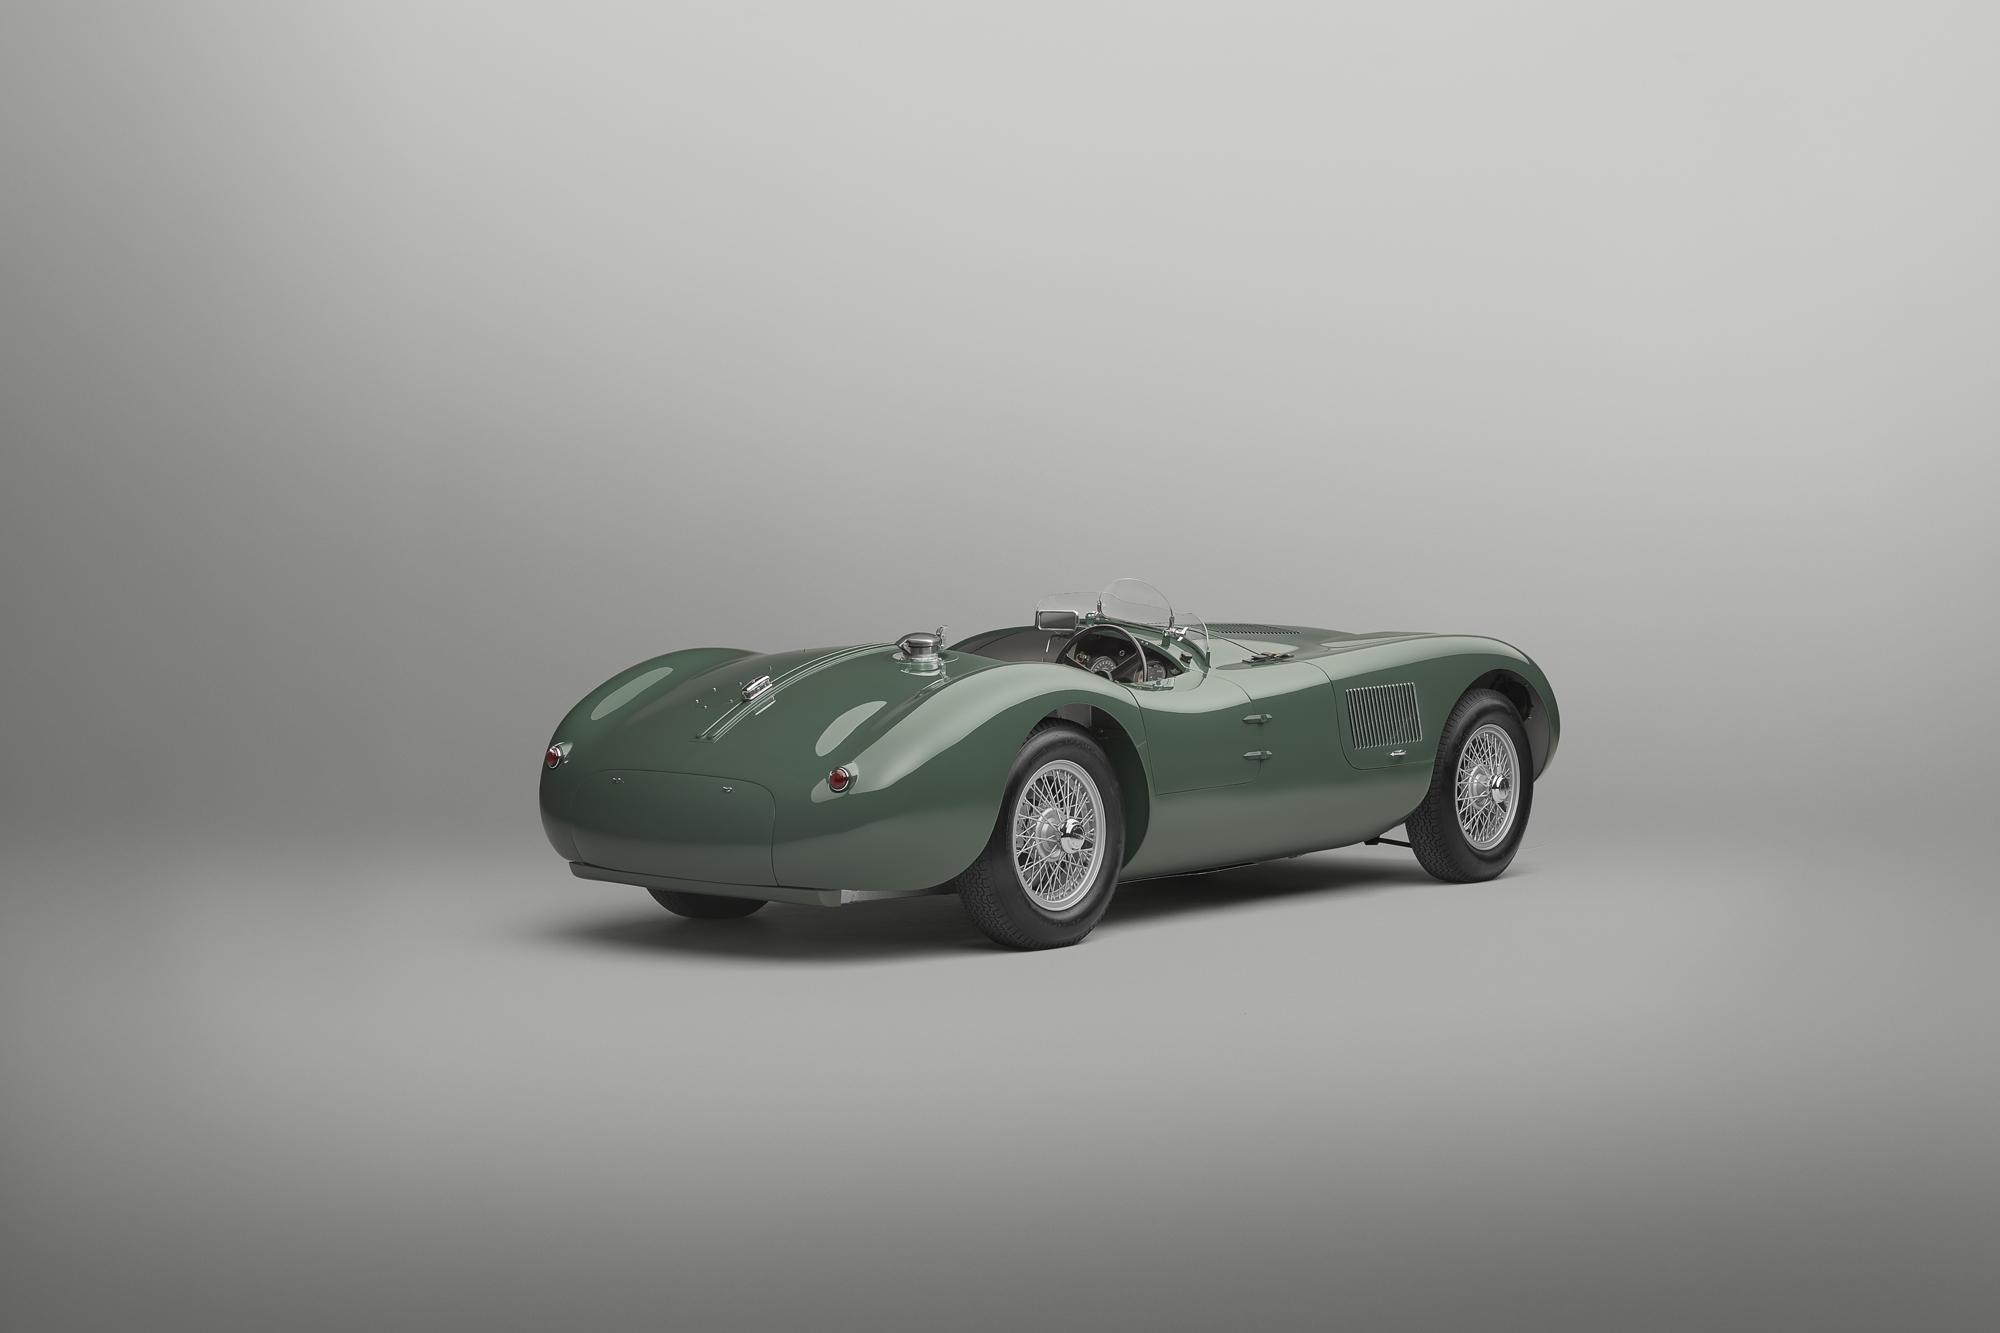 Jaguar C-type continuation rear